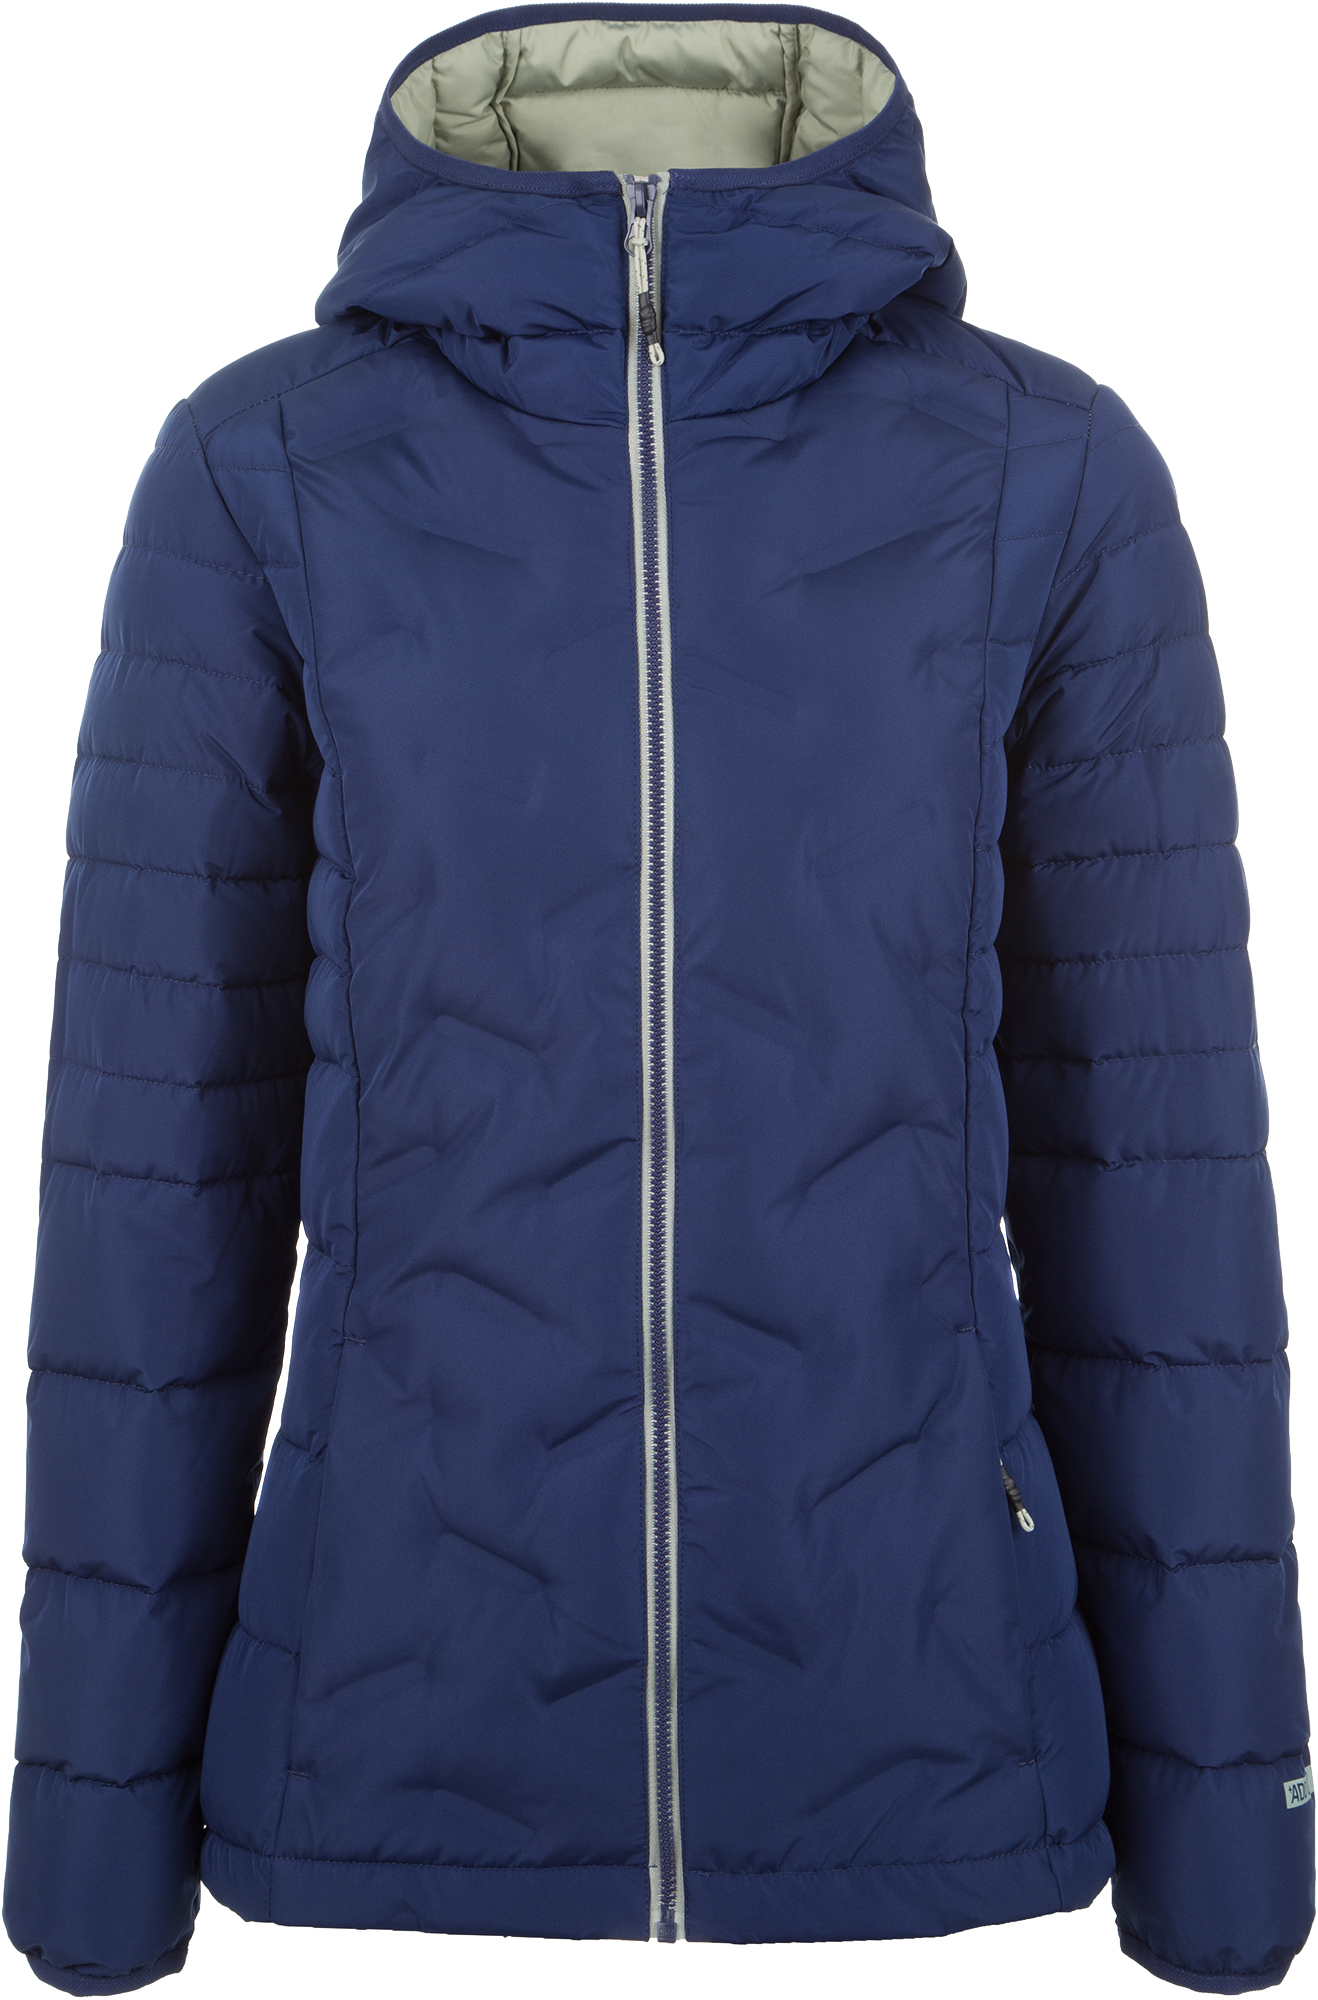 Outventure Куртка пуховая женская Outventure, размер 46 pajar куртка пуховая женская cougar xl jet black